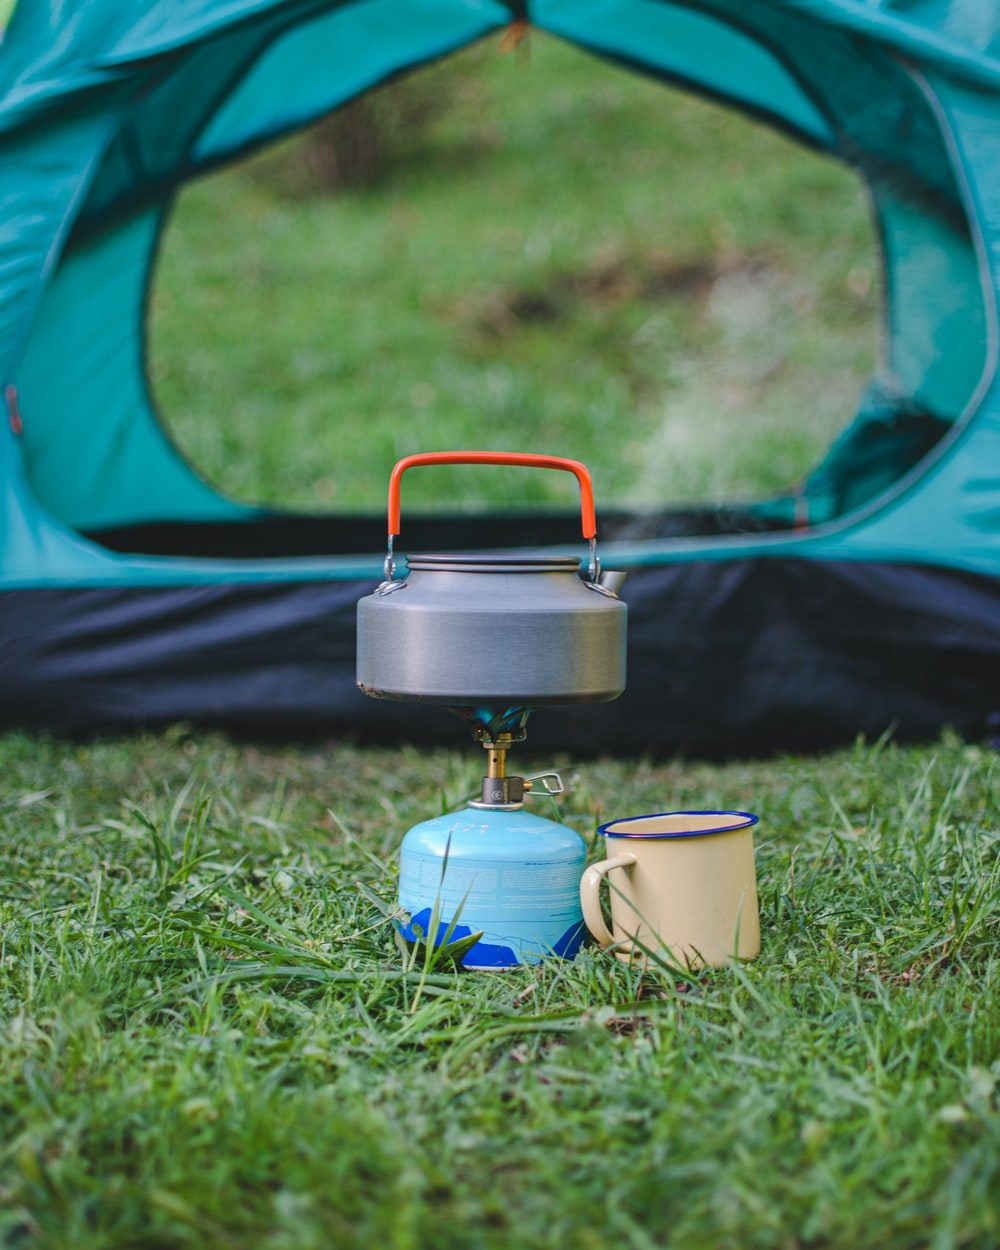 white and blue ceramic mug on green grass field